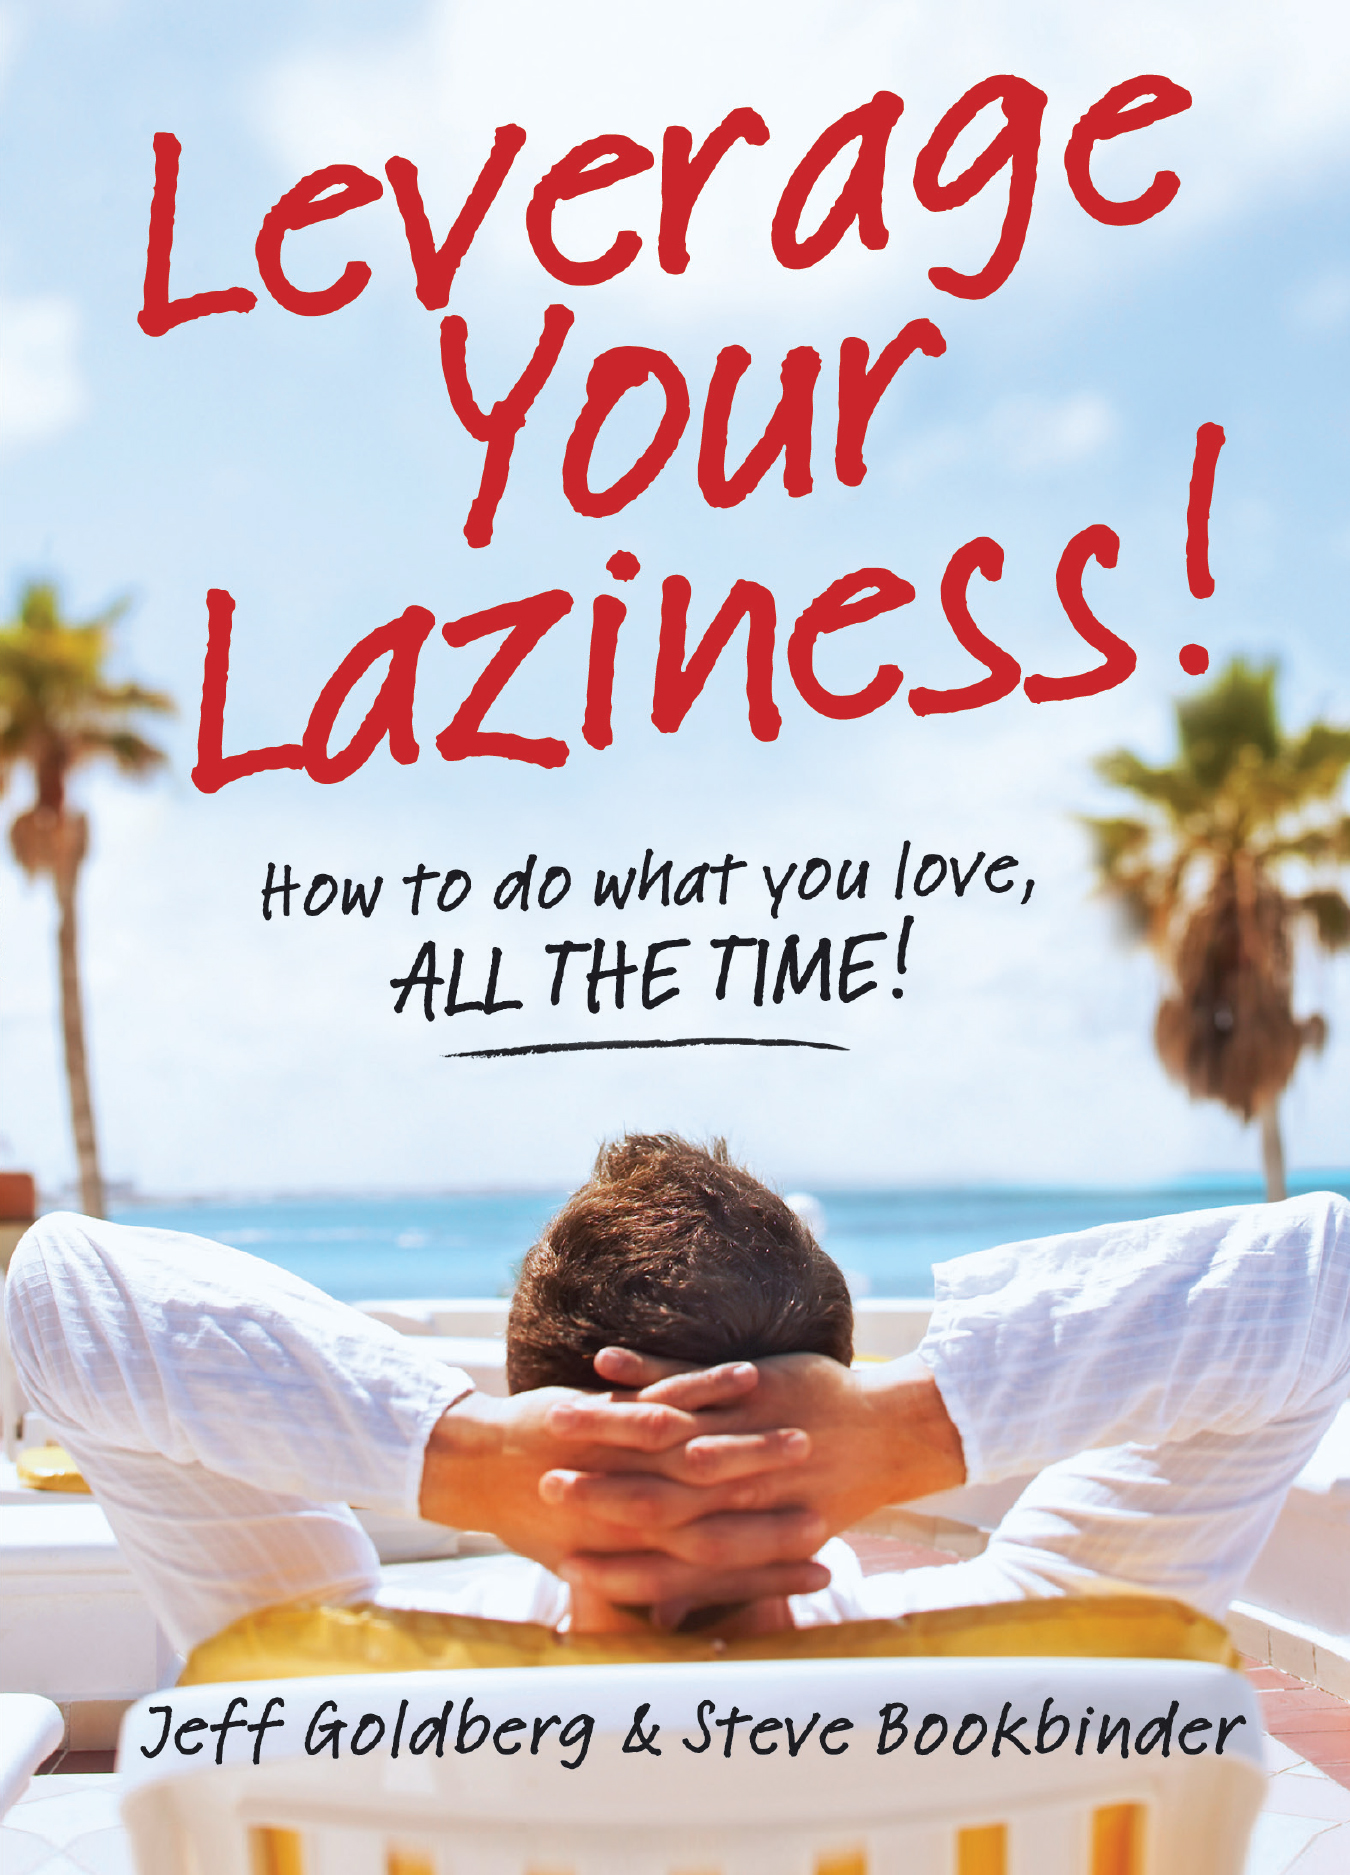 Leverage Your Laziness - Jeff Goldberg and Steve Bookbinder